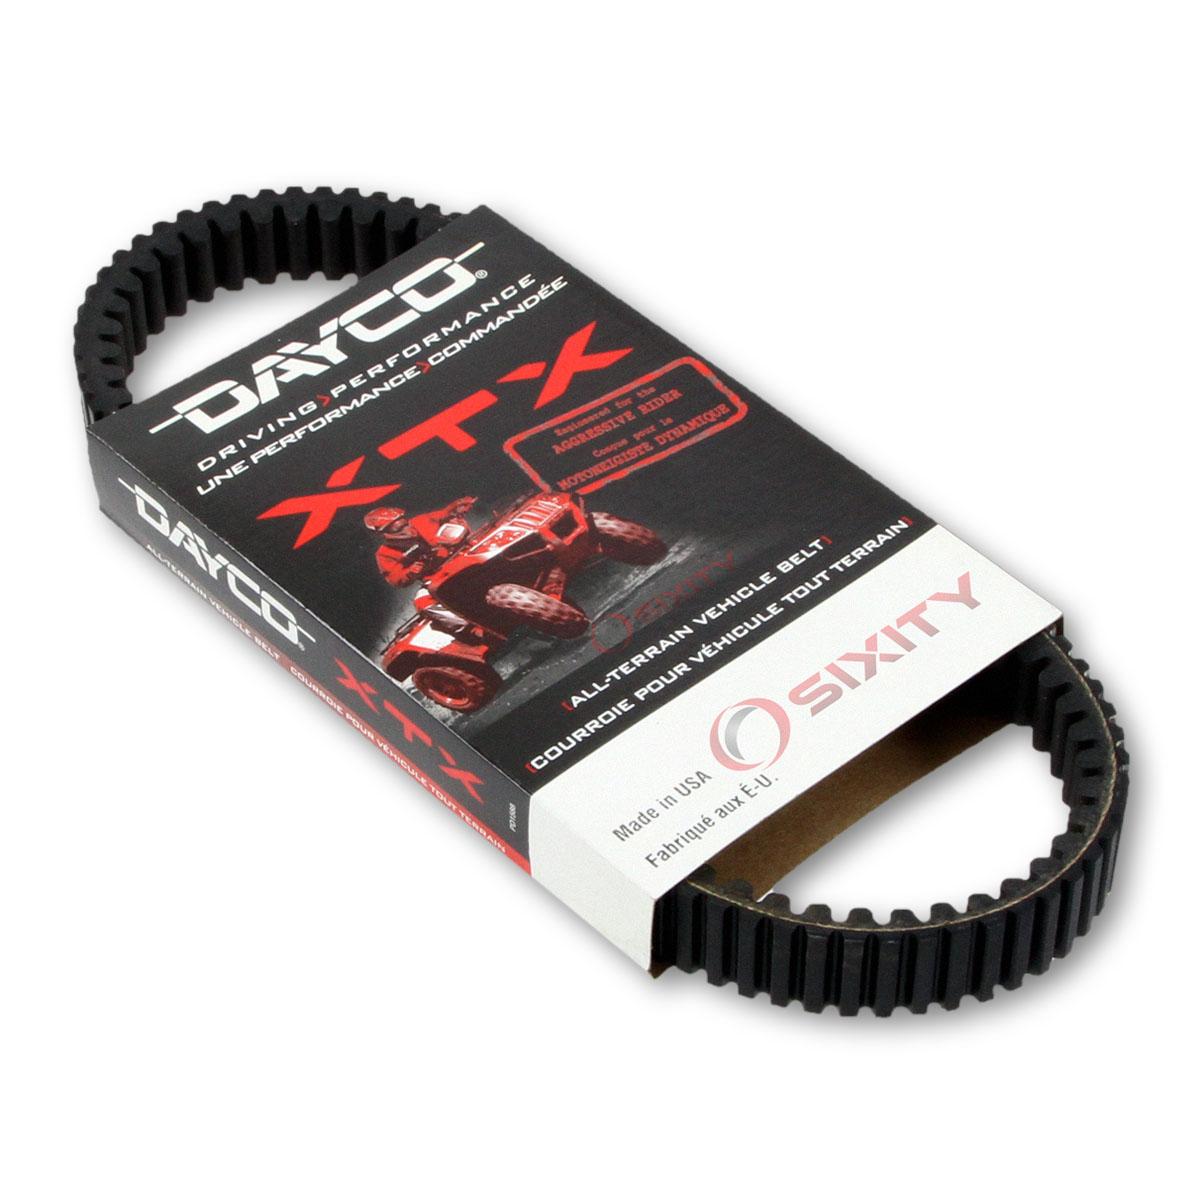 Prowler XTX 700 ARCTIC CAT 2010-12 Dayco Hpx High Performance Extreme Drive Belt